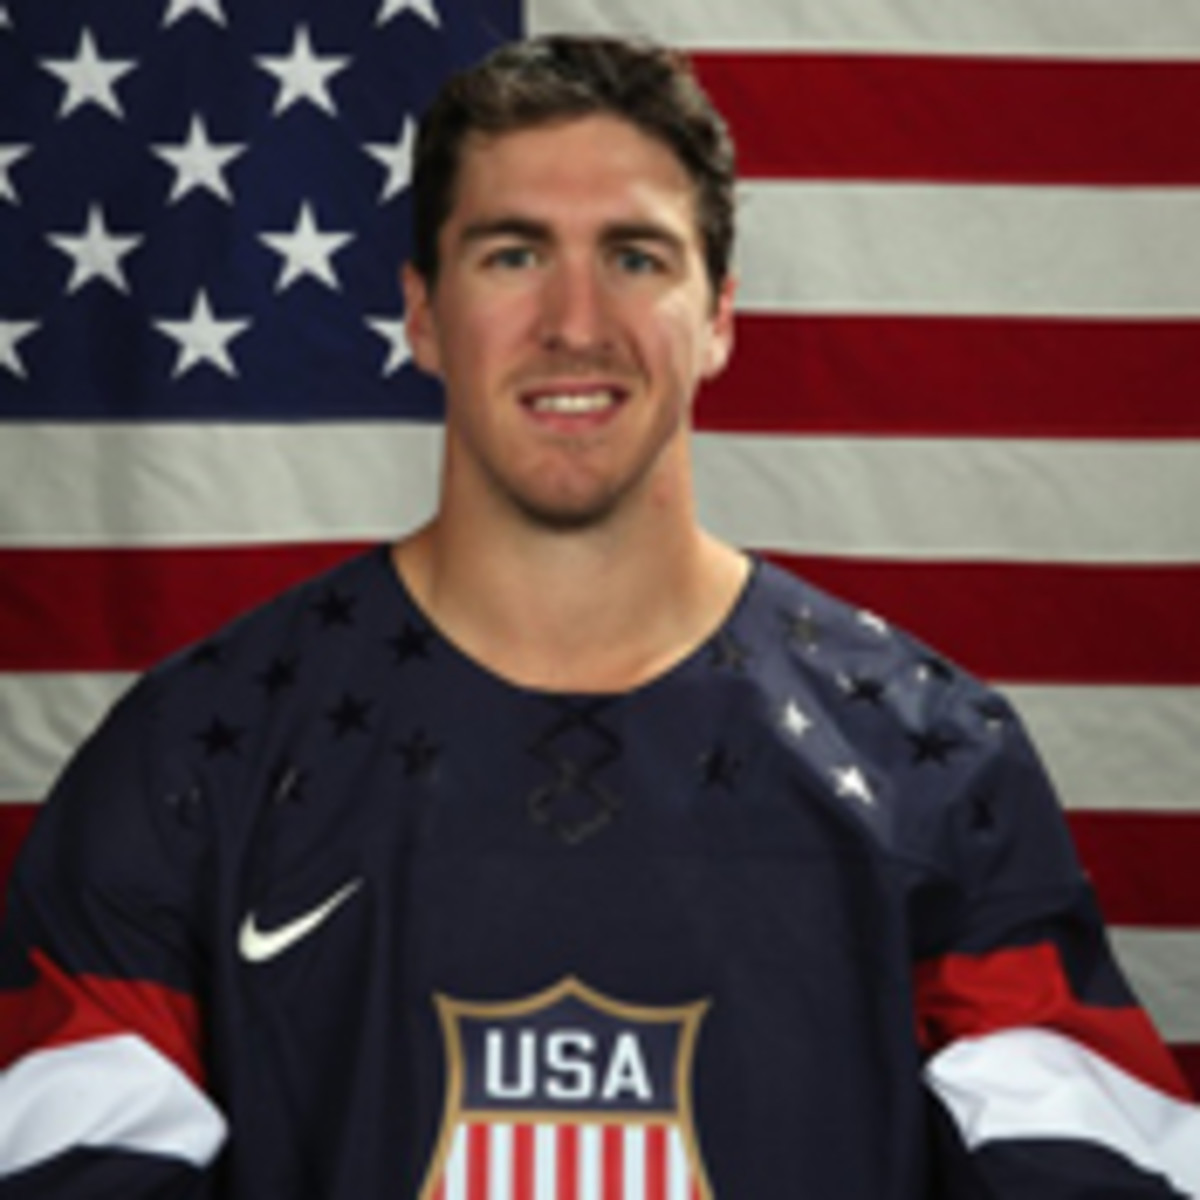 ryan mcdonagh 2014 us men's olympic hockey